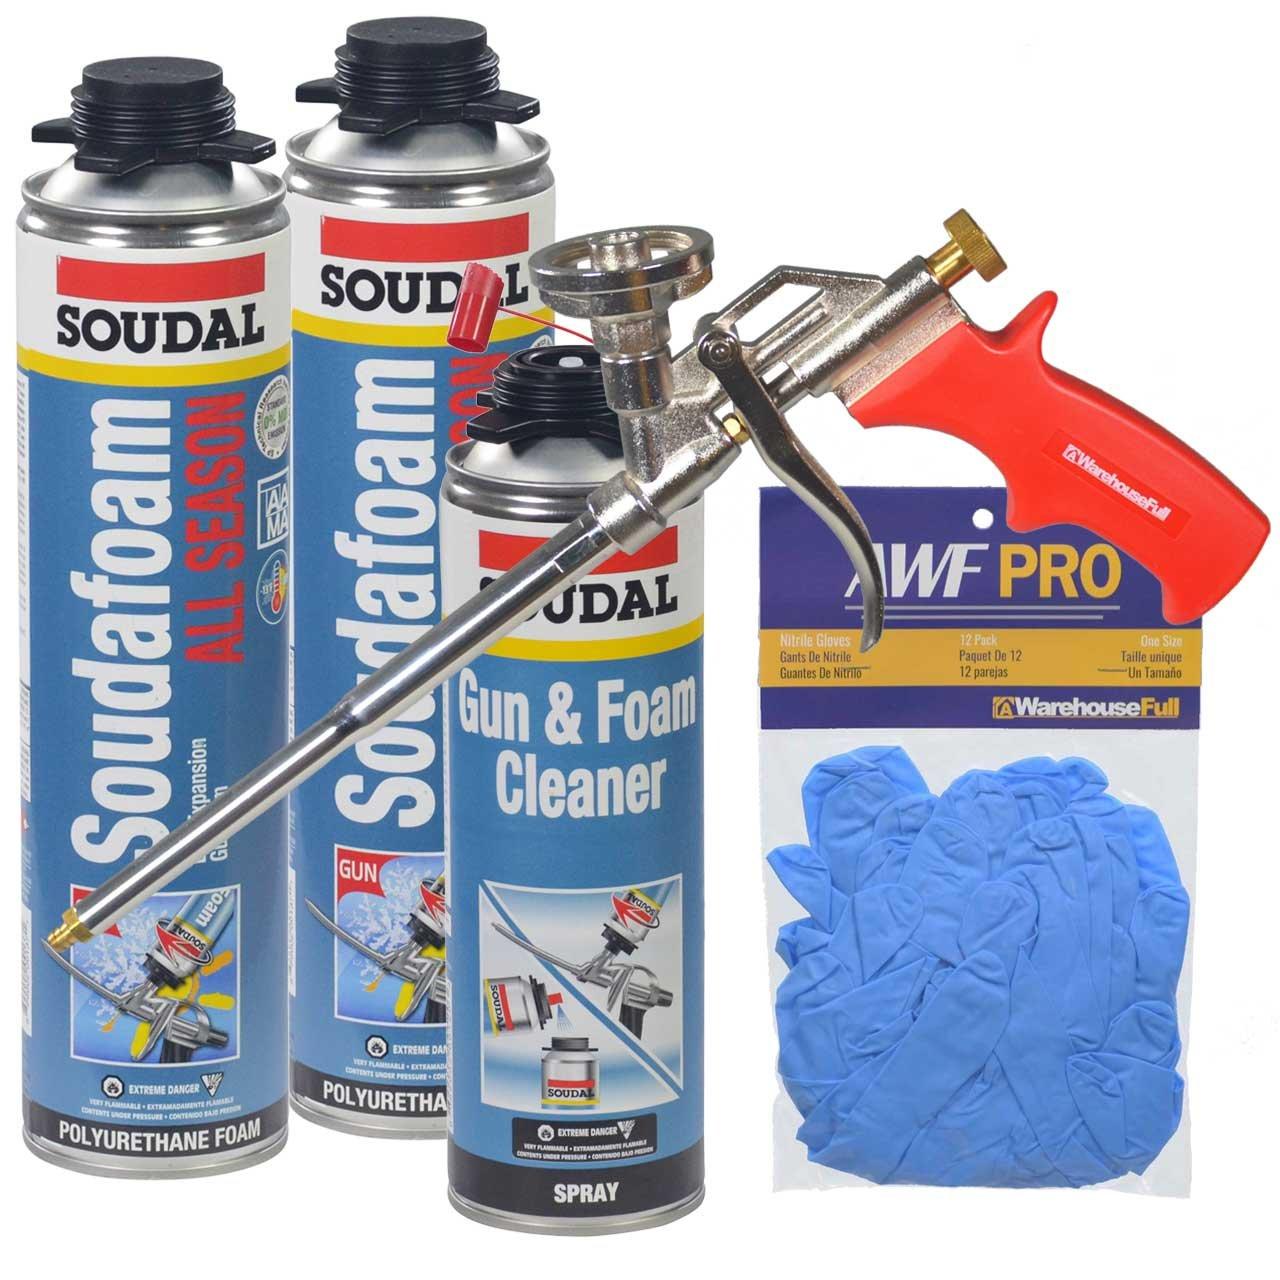 Soudal All Season Window & Door Foam Kit with Foam Gun, Gun Cleaner and Gloves